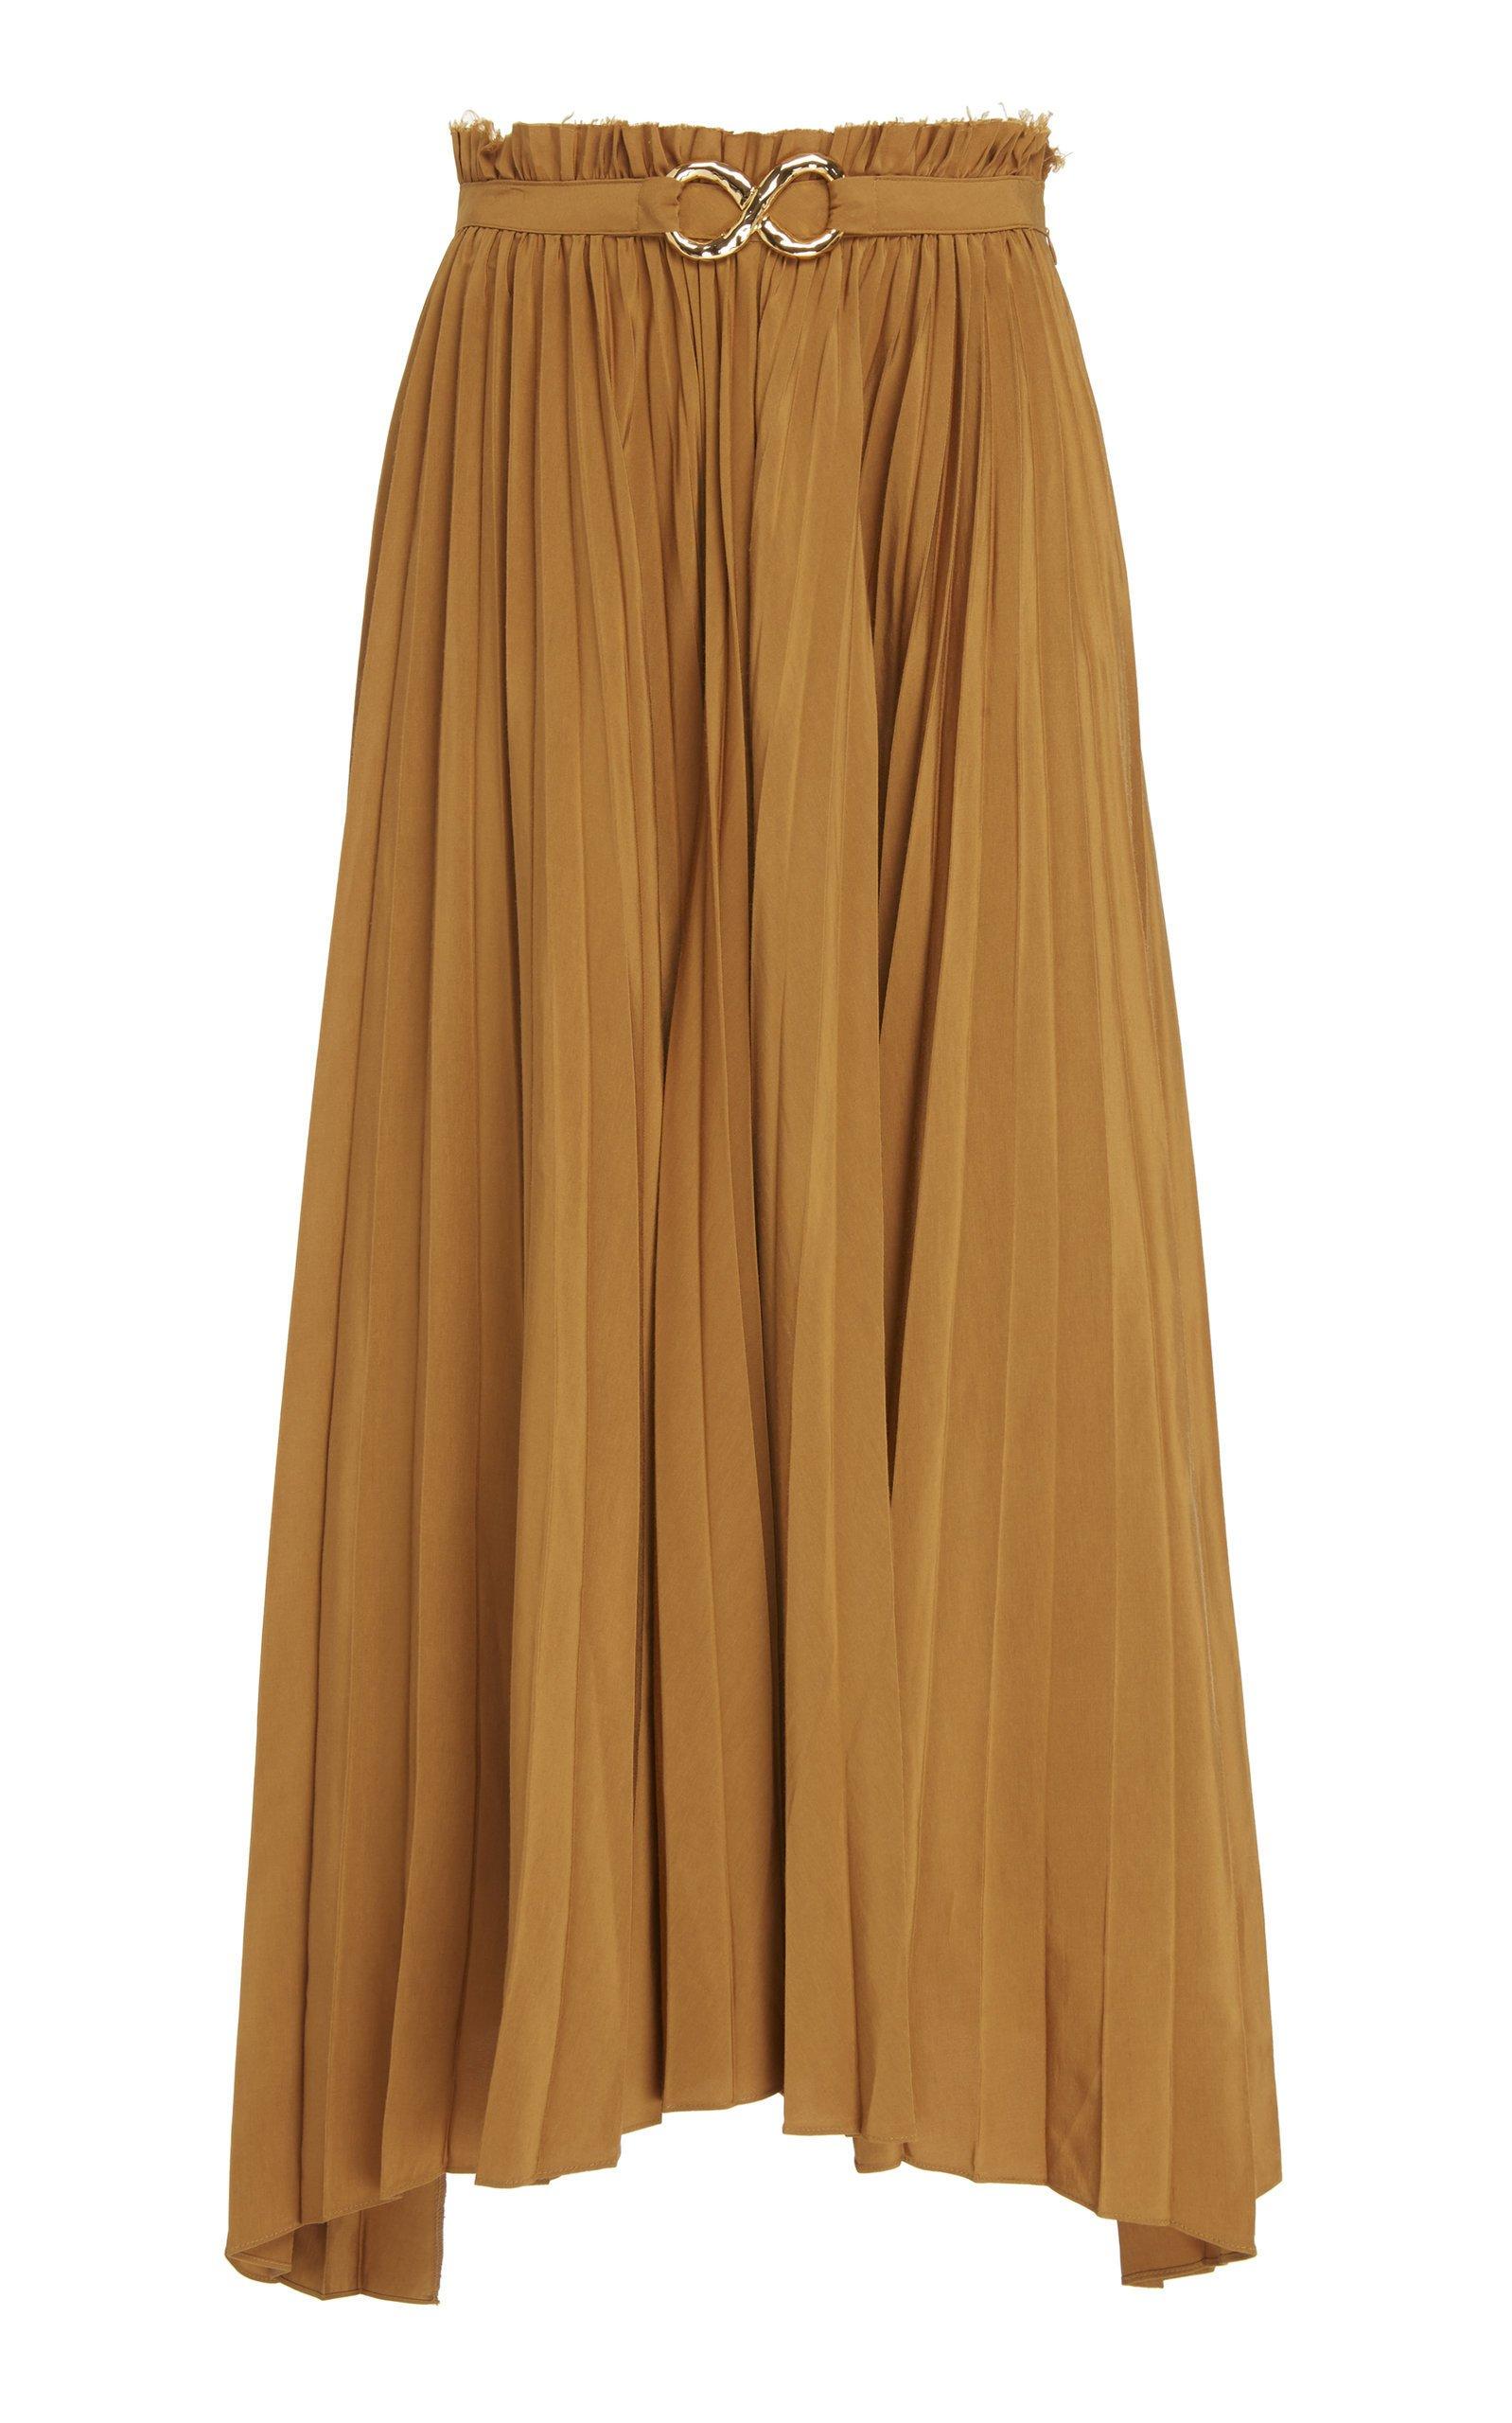 Rejina Pyo Kiera Pleated Satin Midi Skirt Size: 14